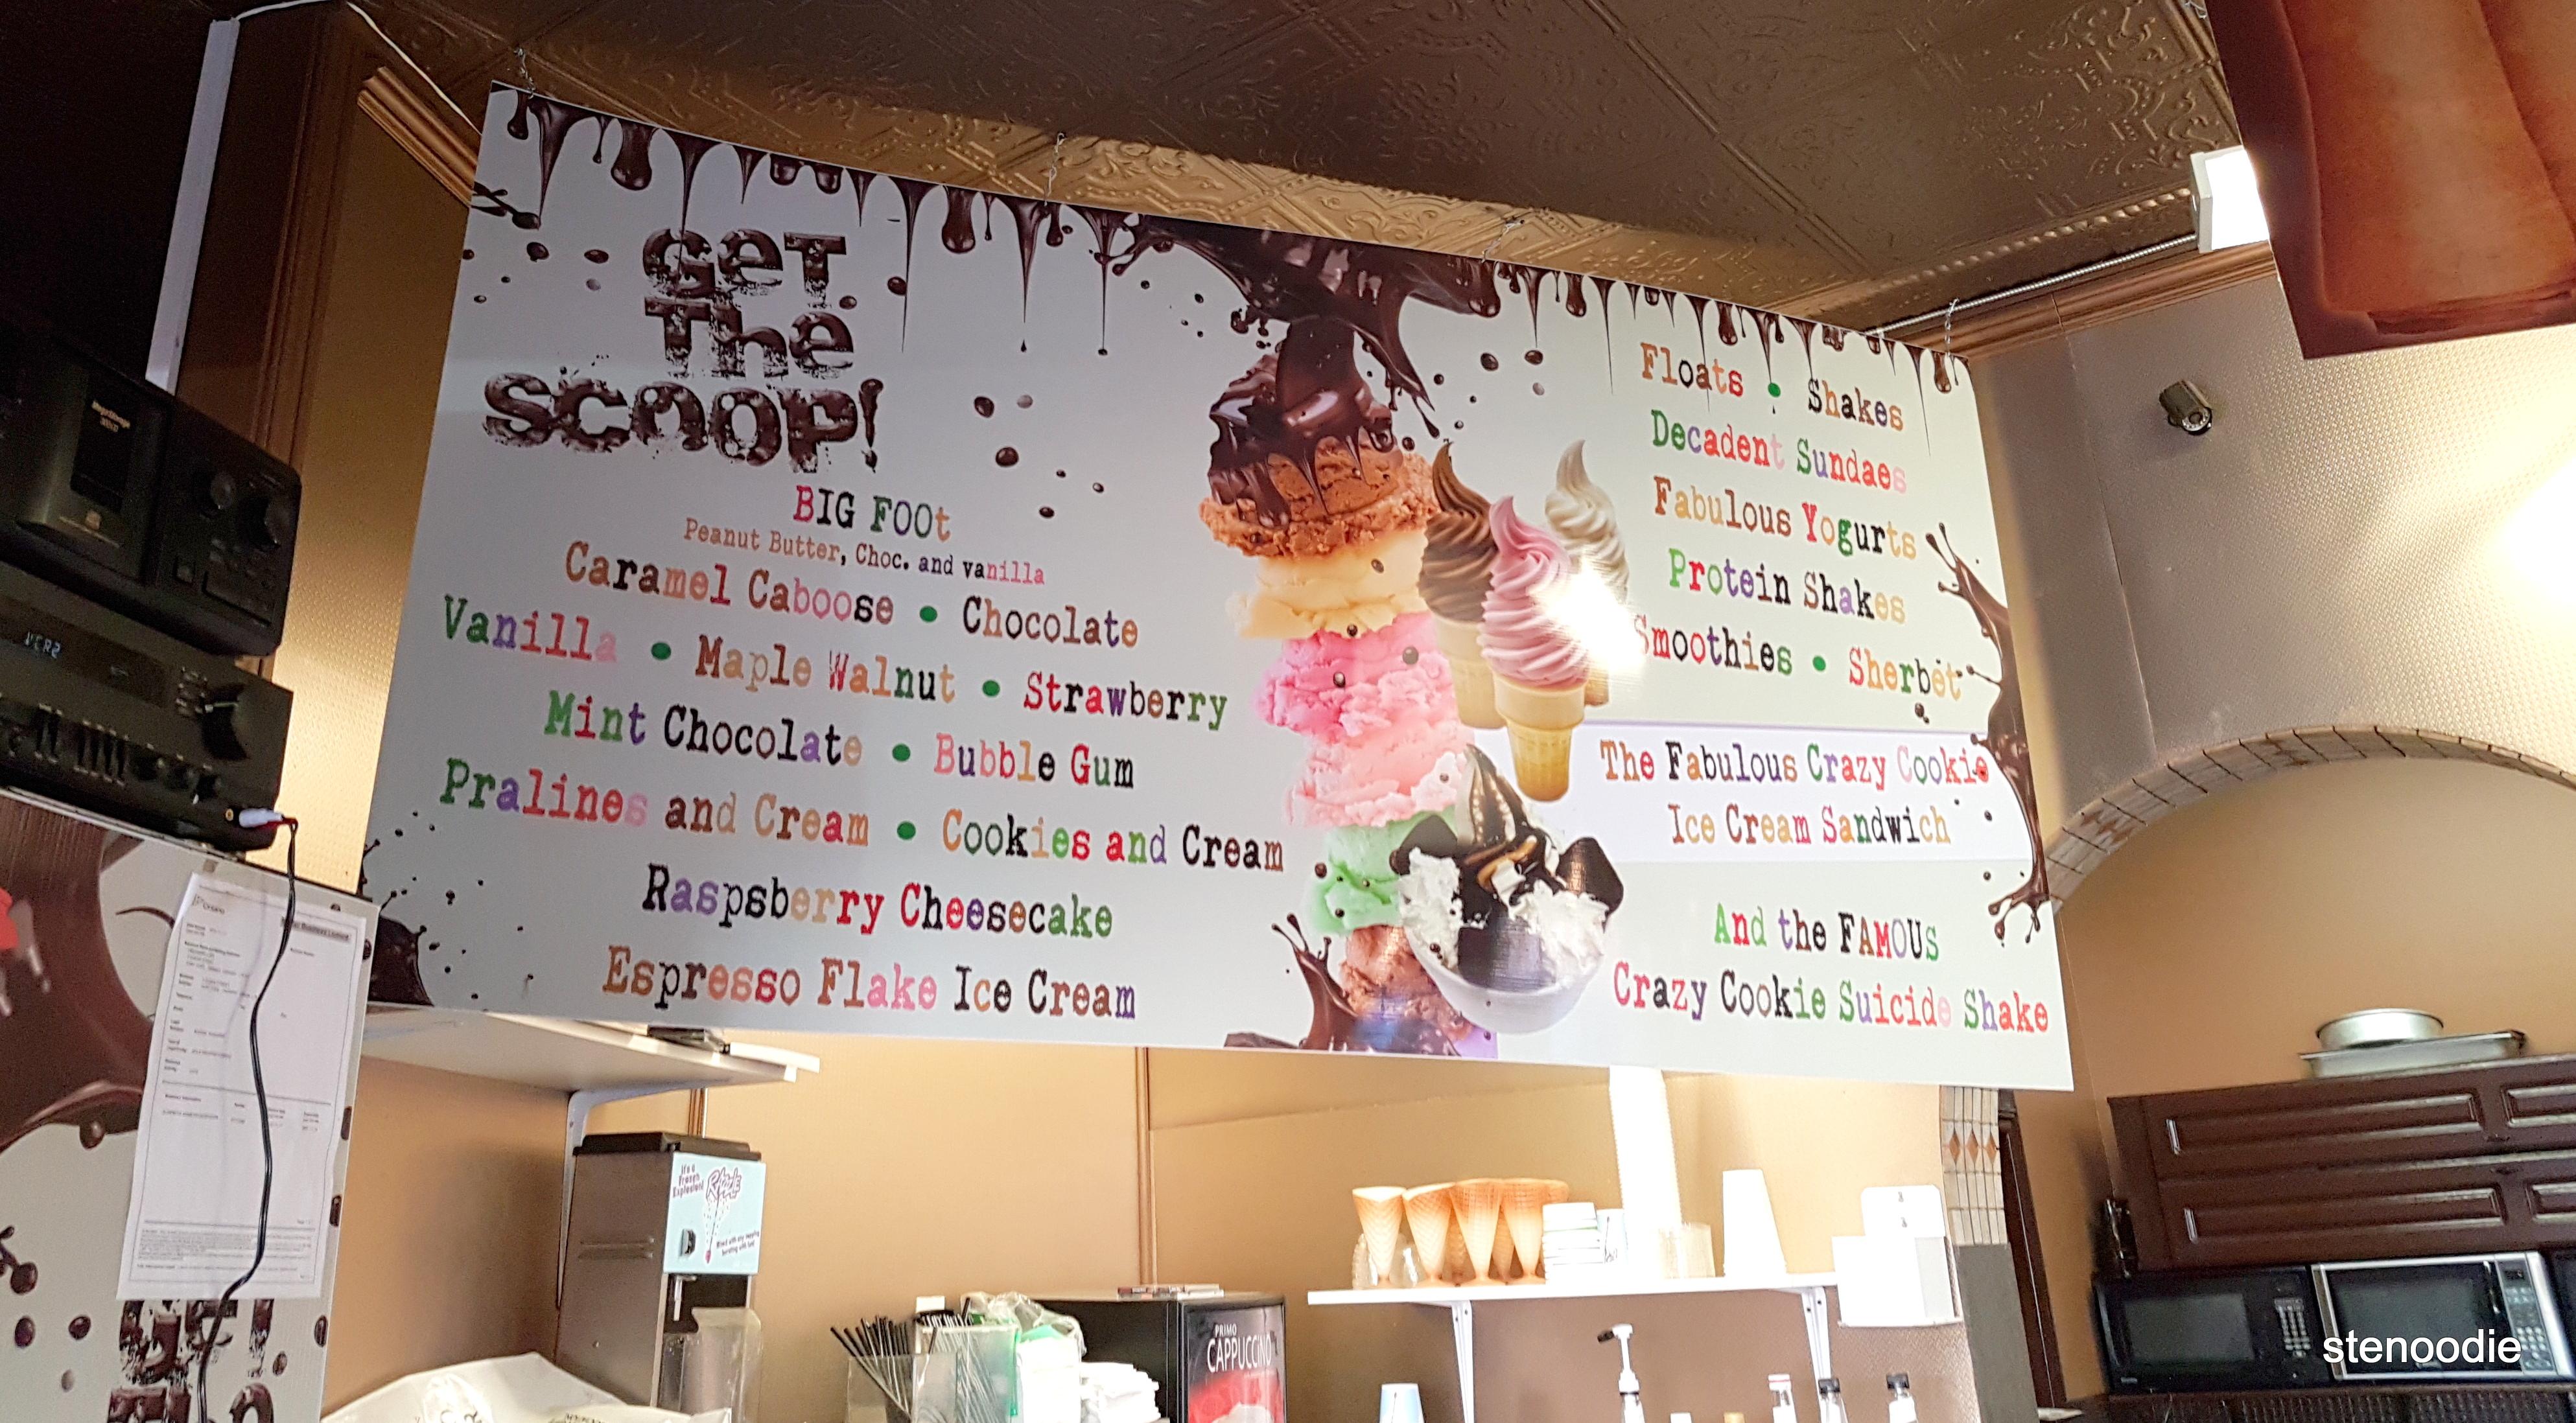 Dreamers' Cafe ice cream menu